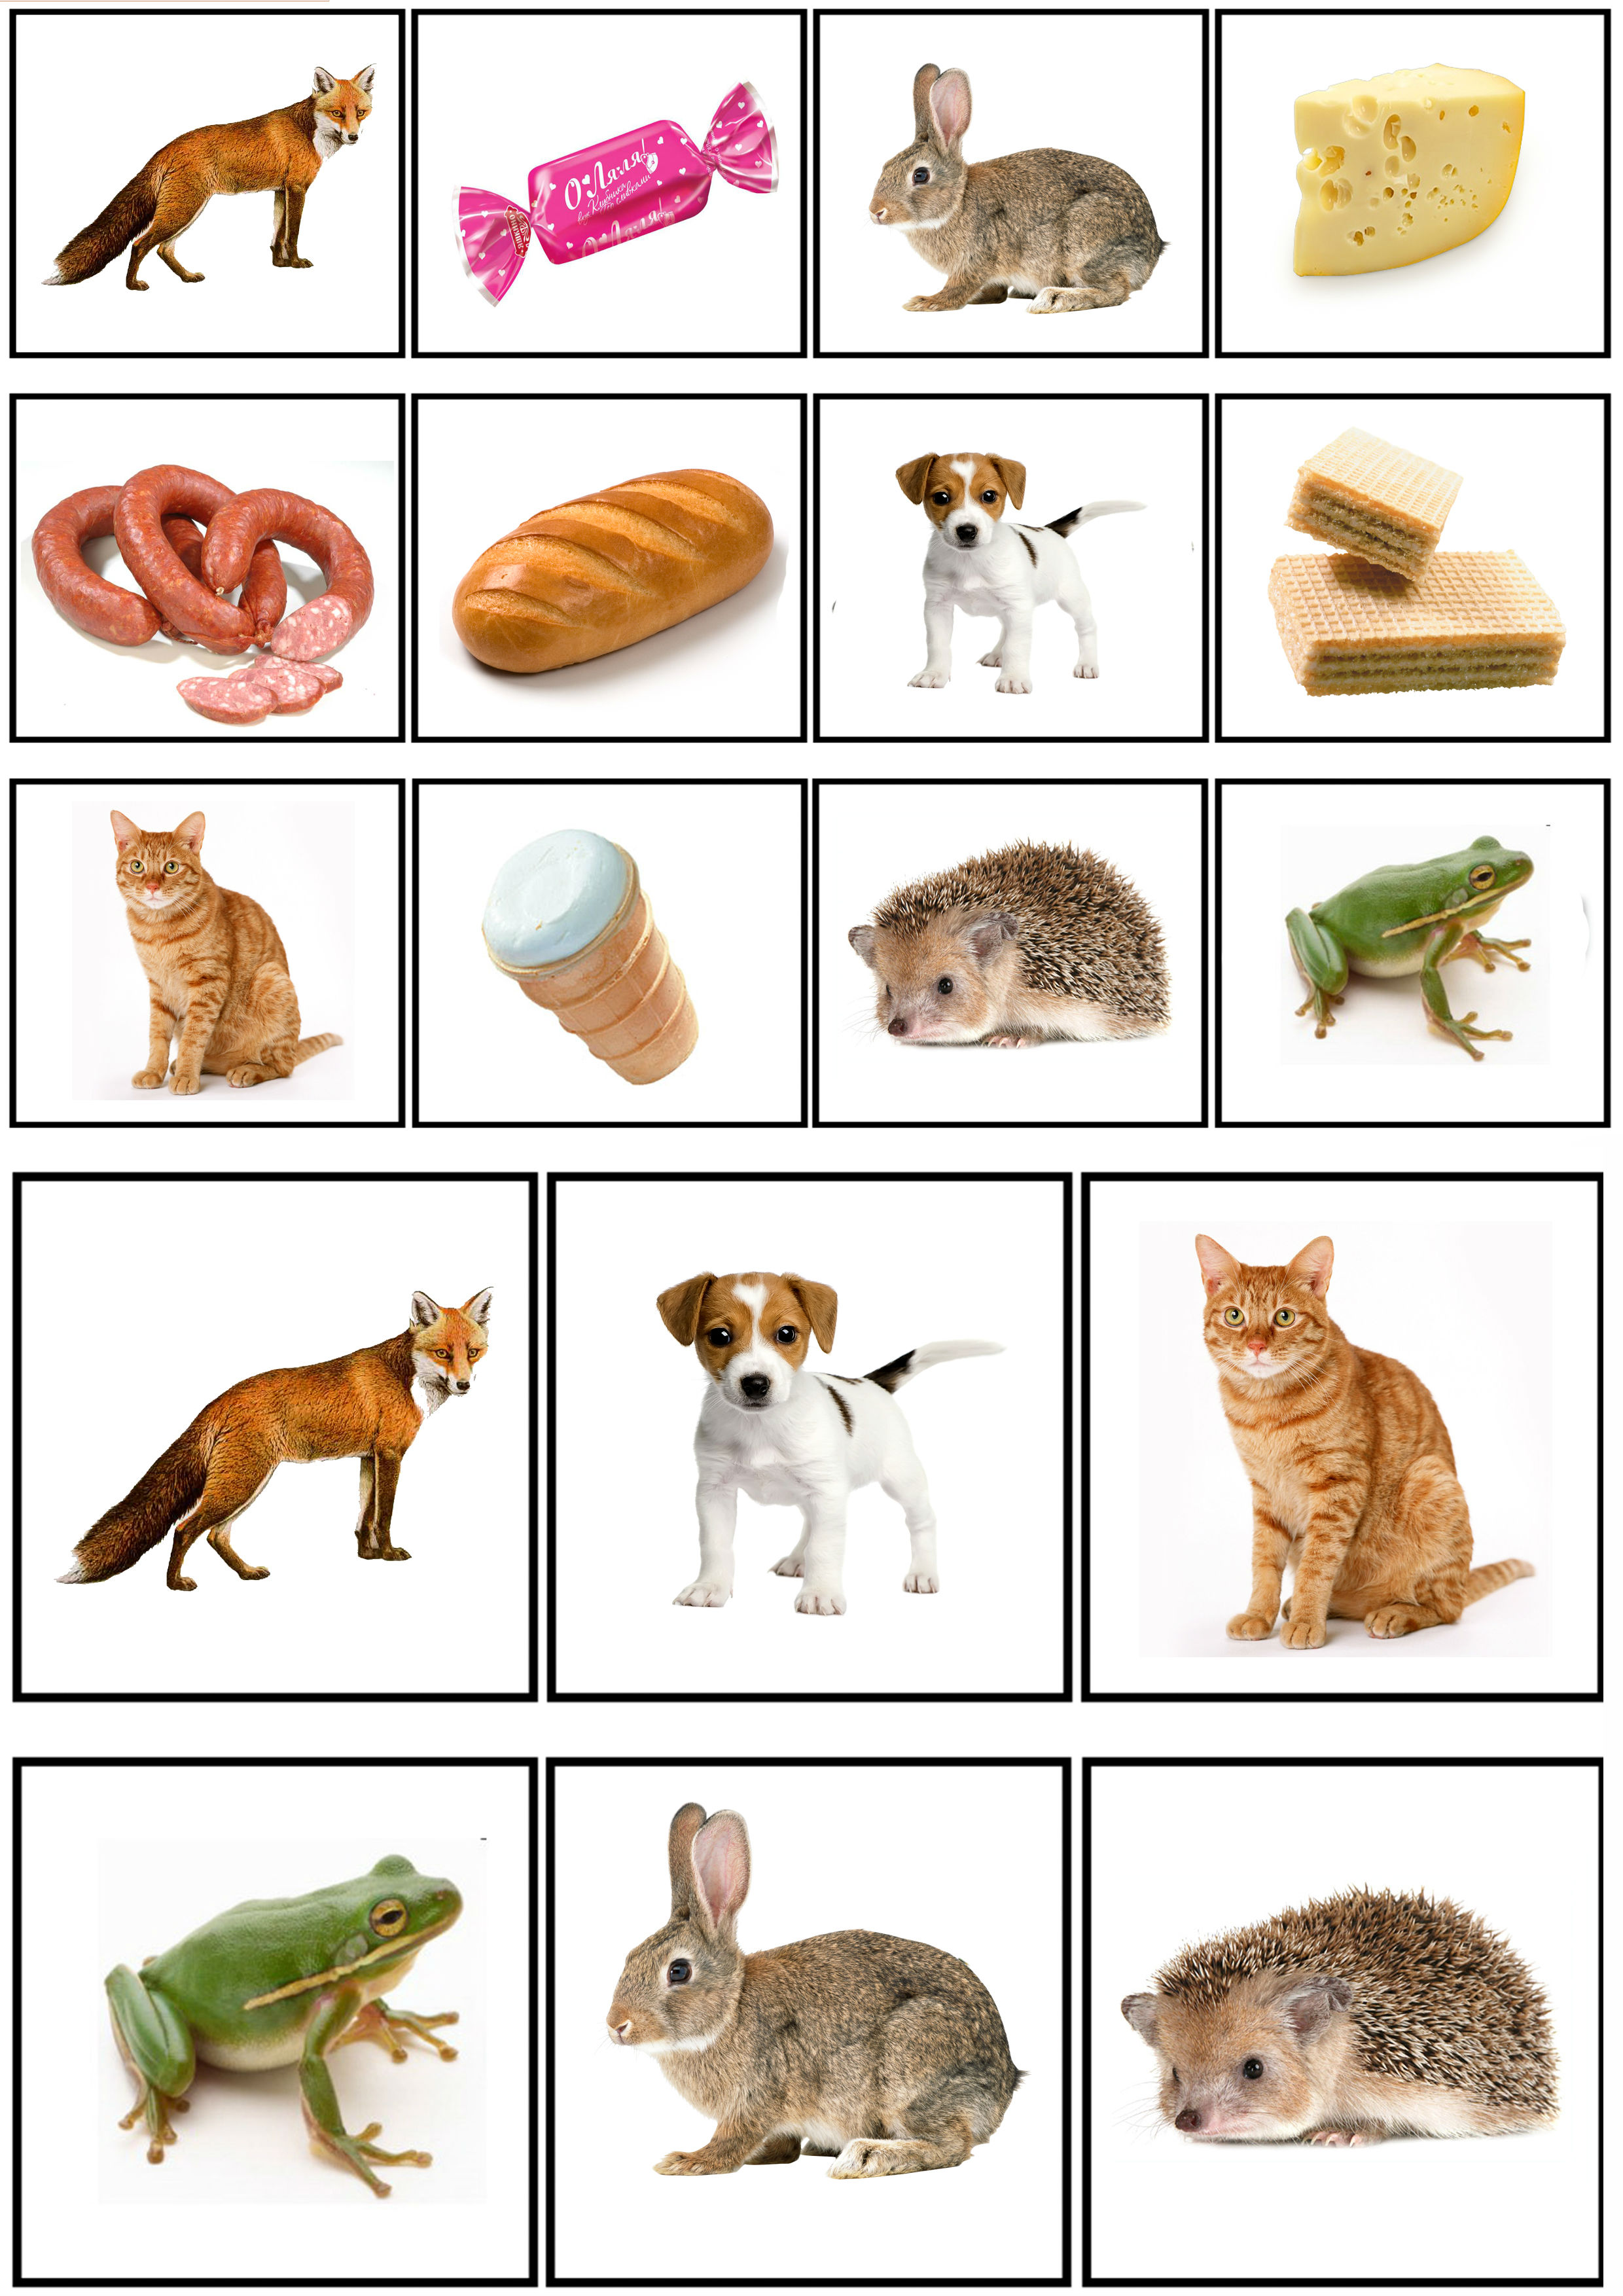 тварини хто де живе картинки